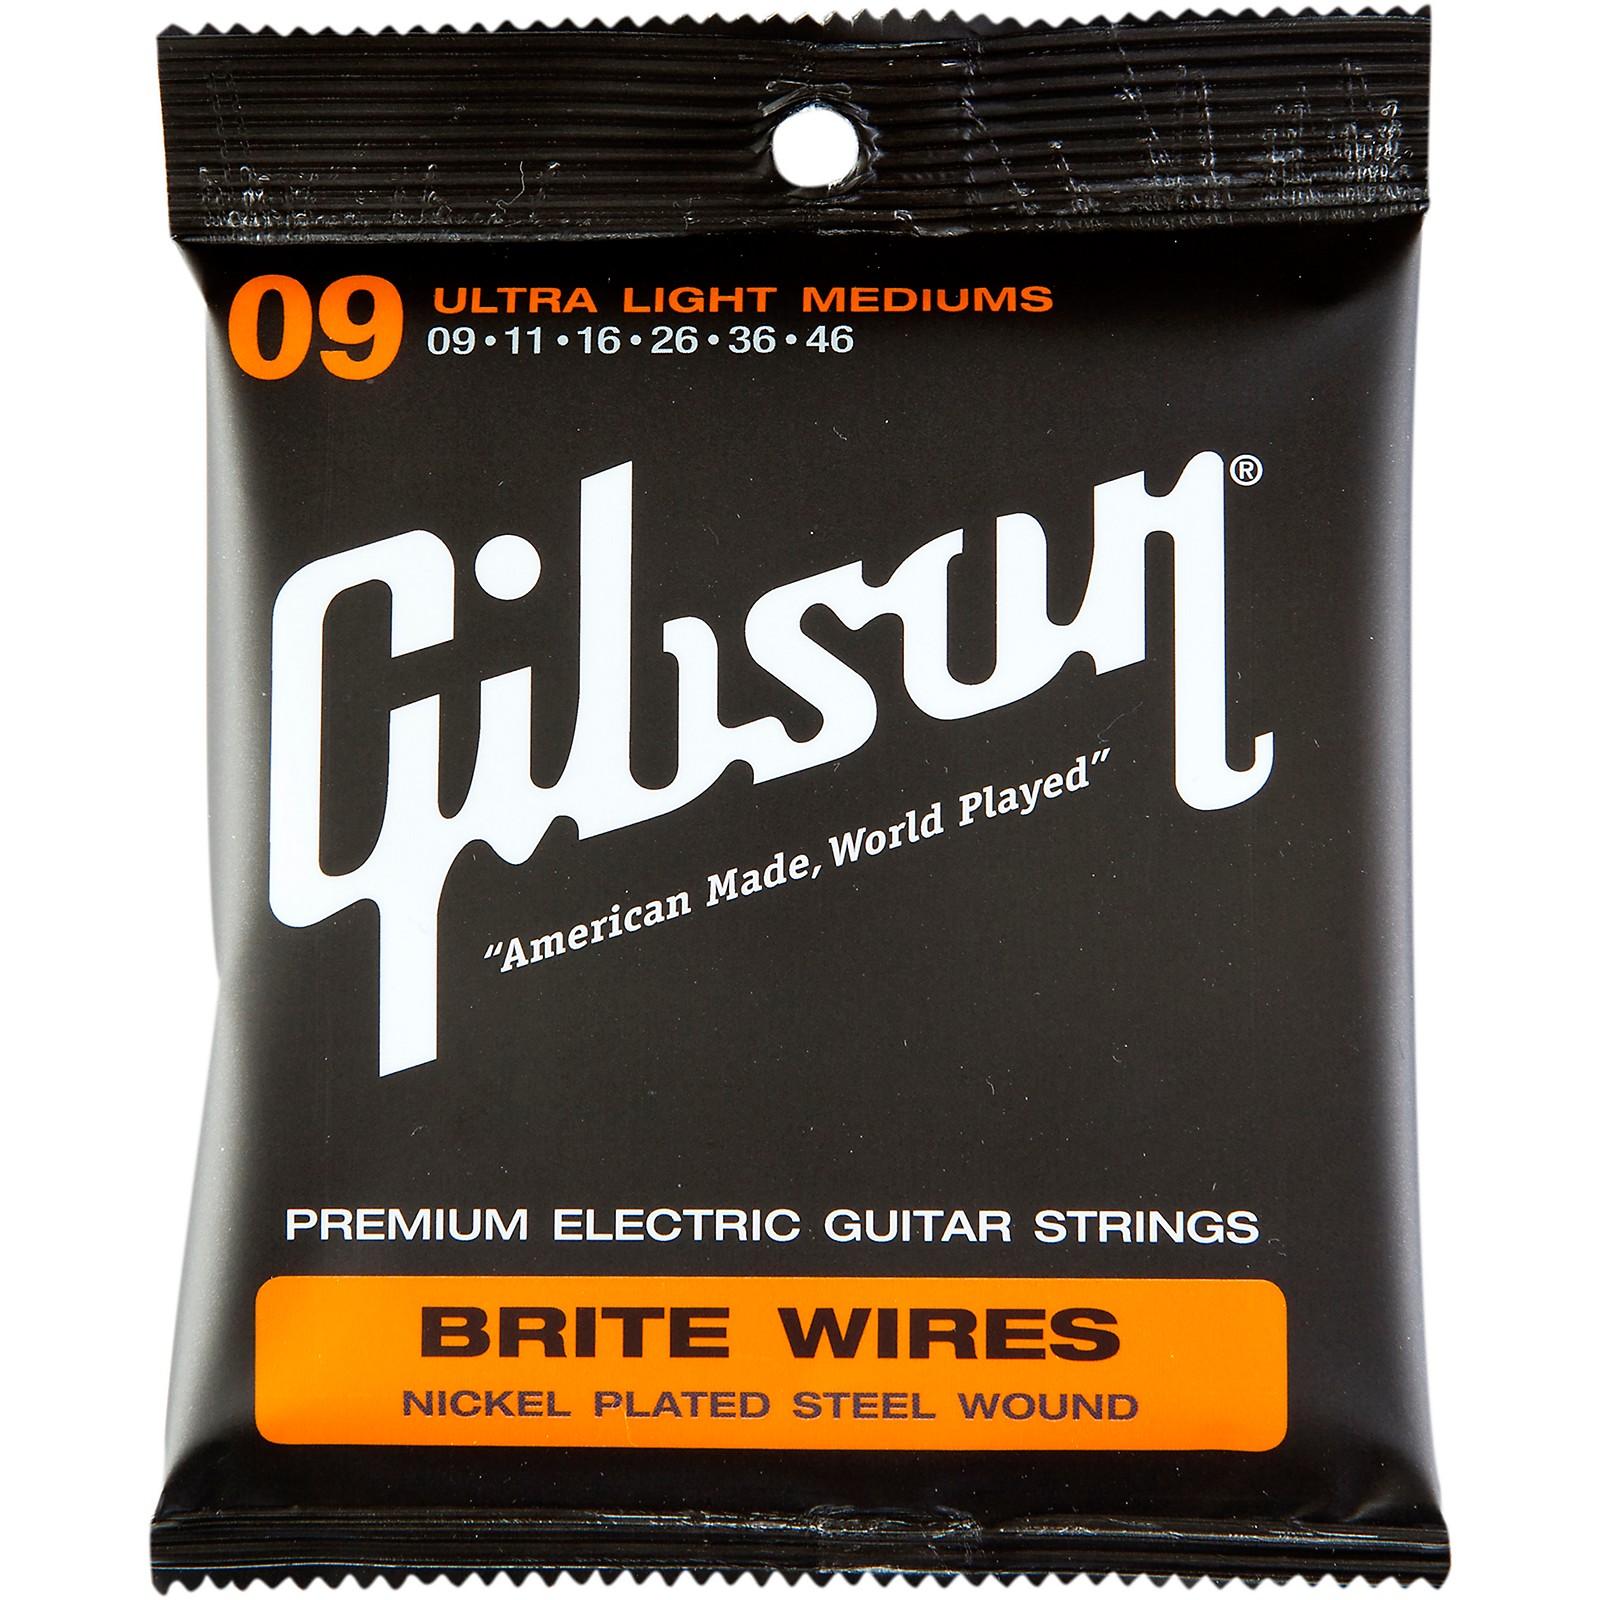 Gibson Brite Wires Ultra Light Custom Guitar Strings 3 Pack